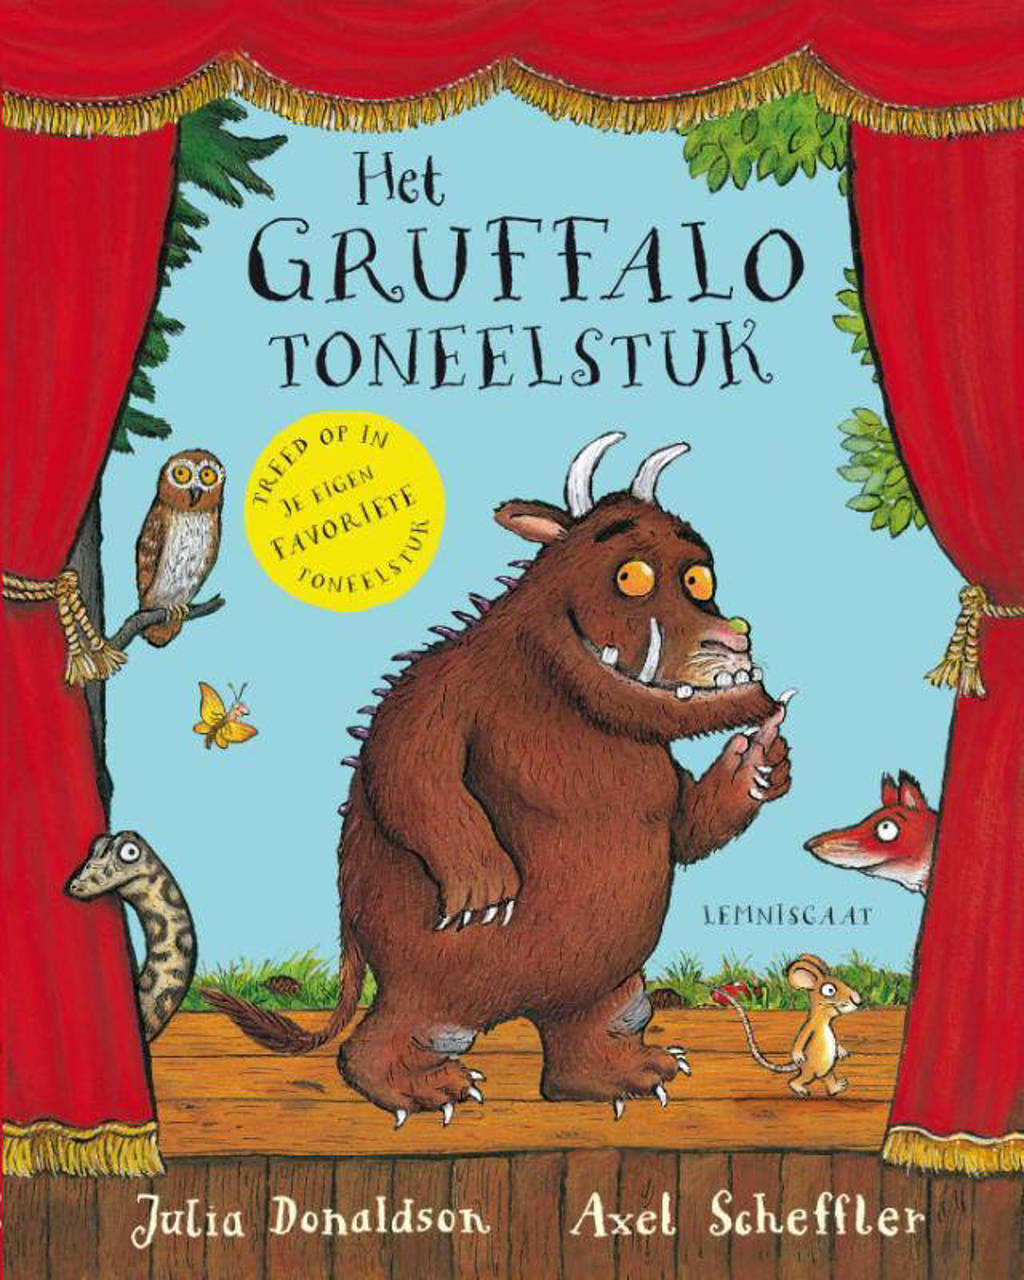 Het Gruffalo toneelstuk - Julia Donaldson en Axel Scheffler